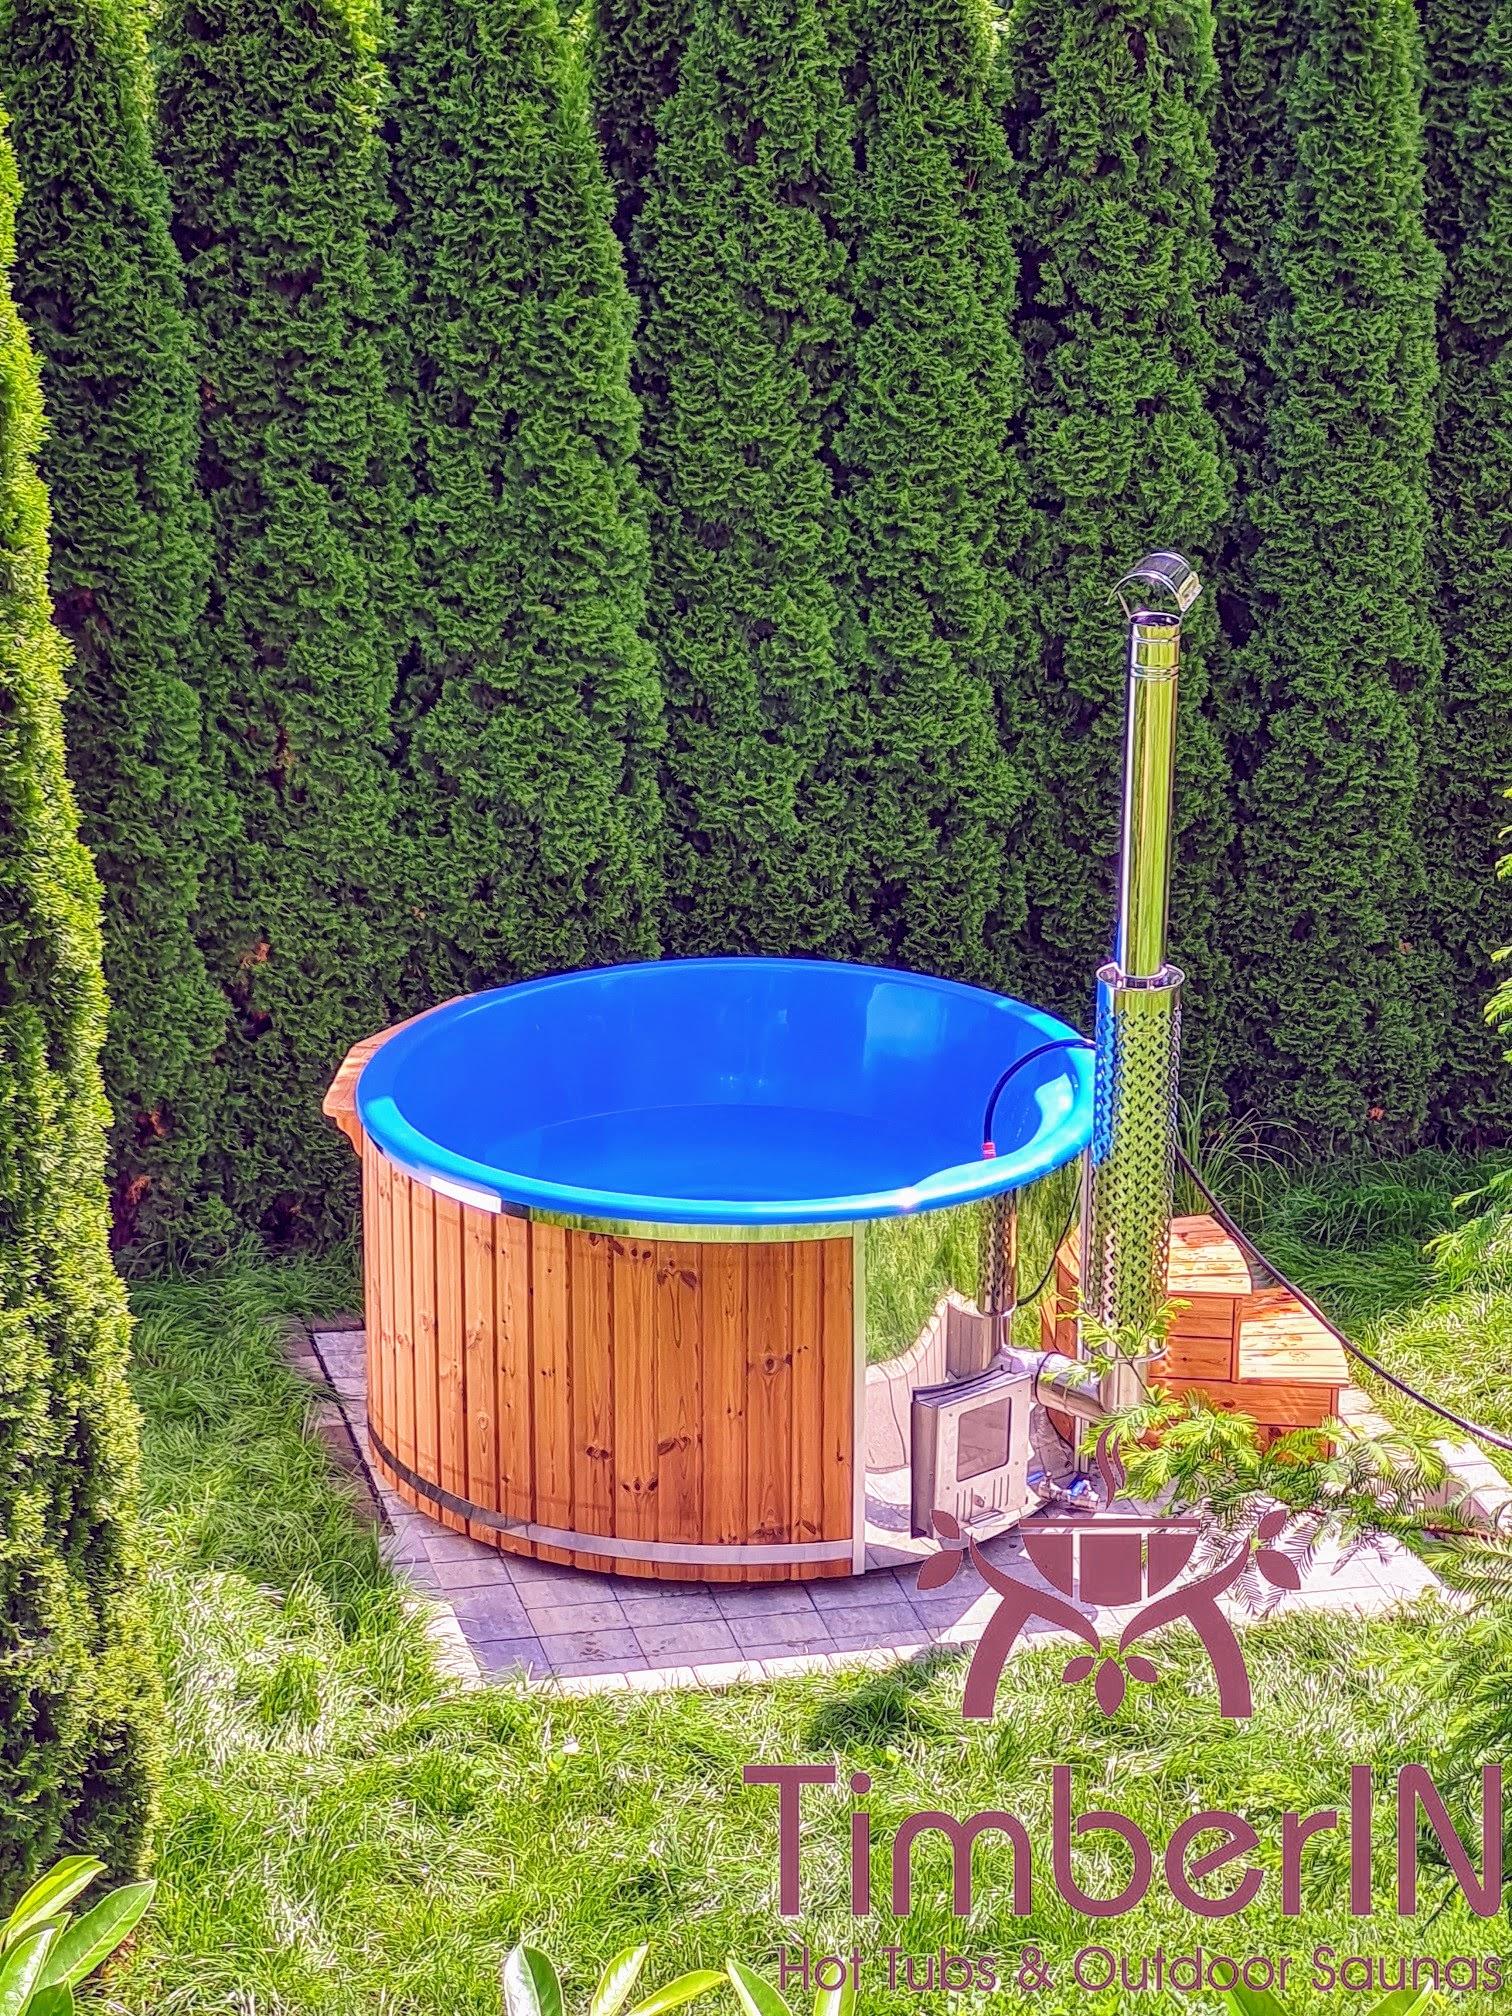 Badetonne Badebottich Hot Tube GFK mit Whirlpoolfunktion 3 8